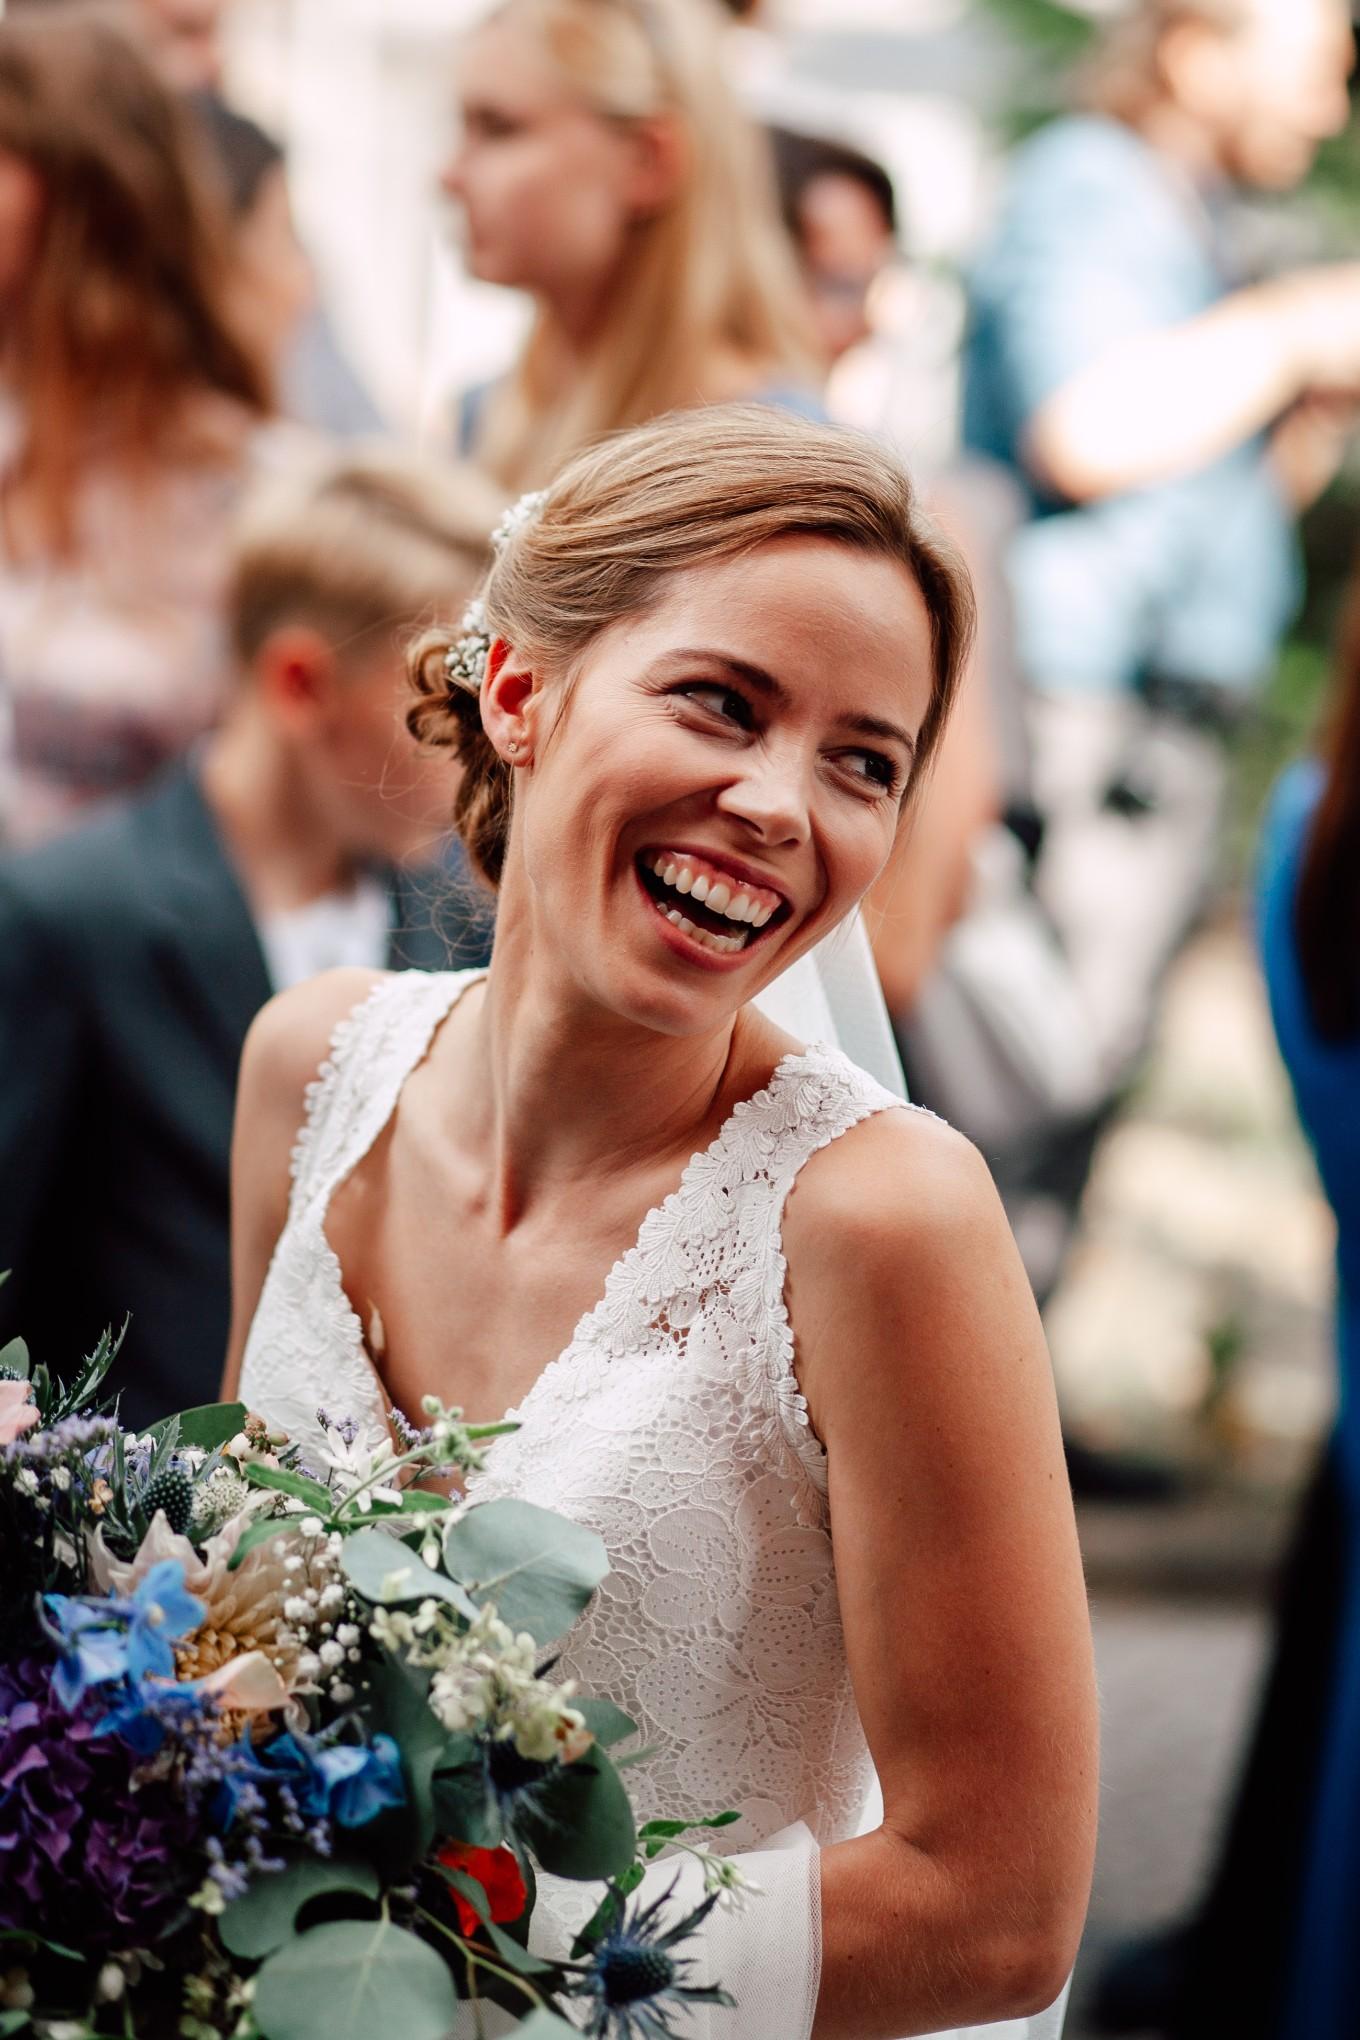 Berlin-Wannsee-Pia-Anna-Christian-Wedding-Photography-ST-33.jpg